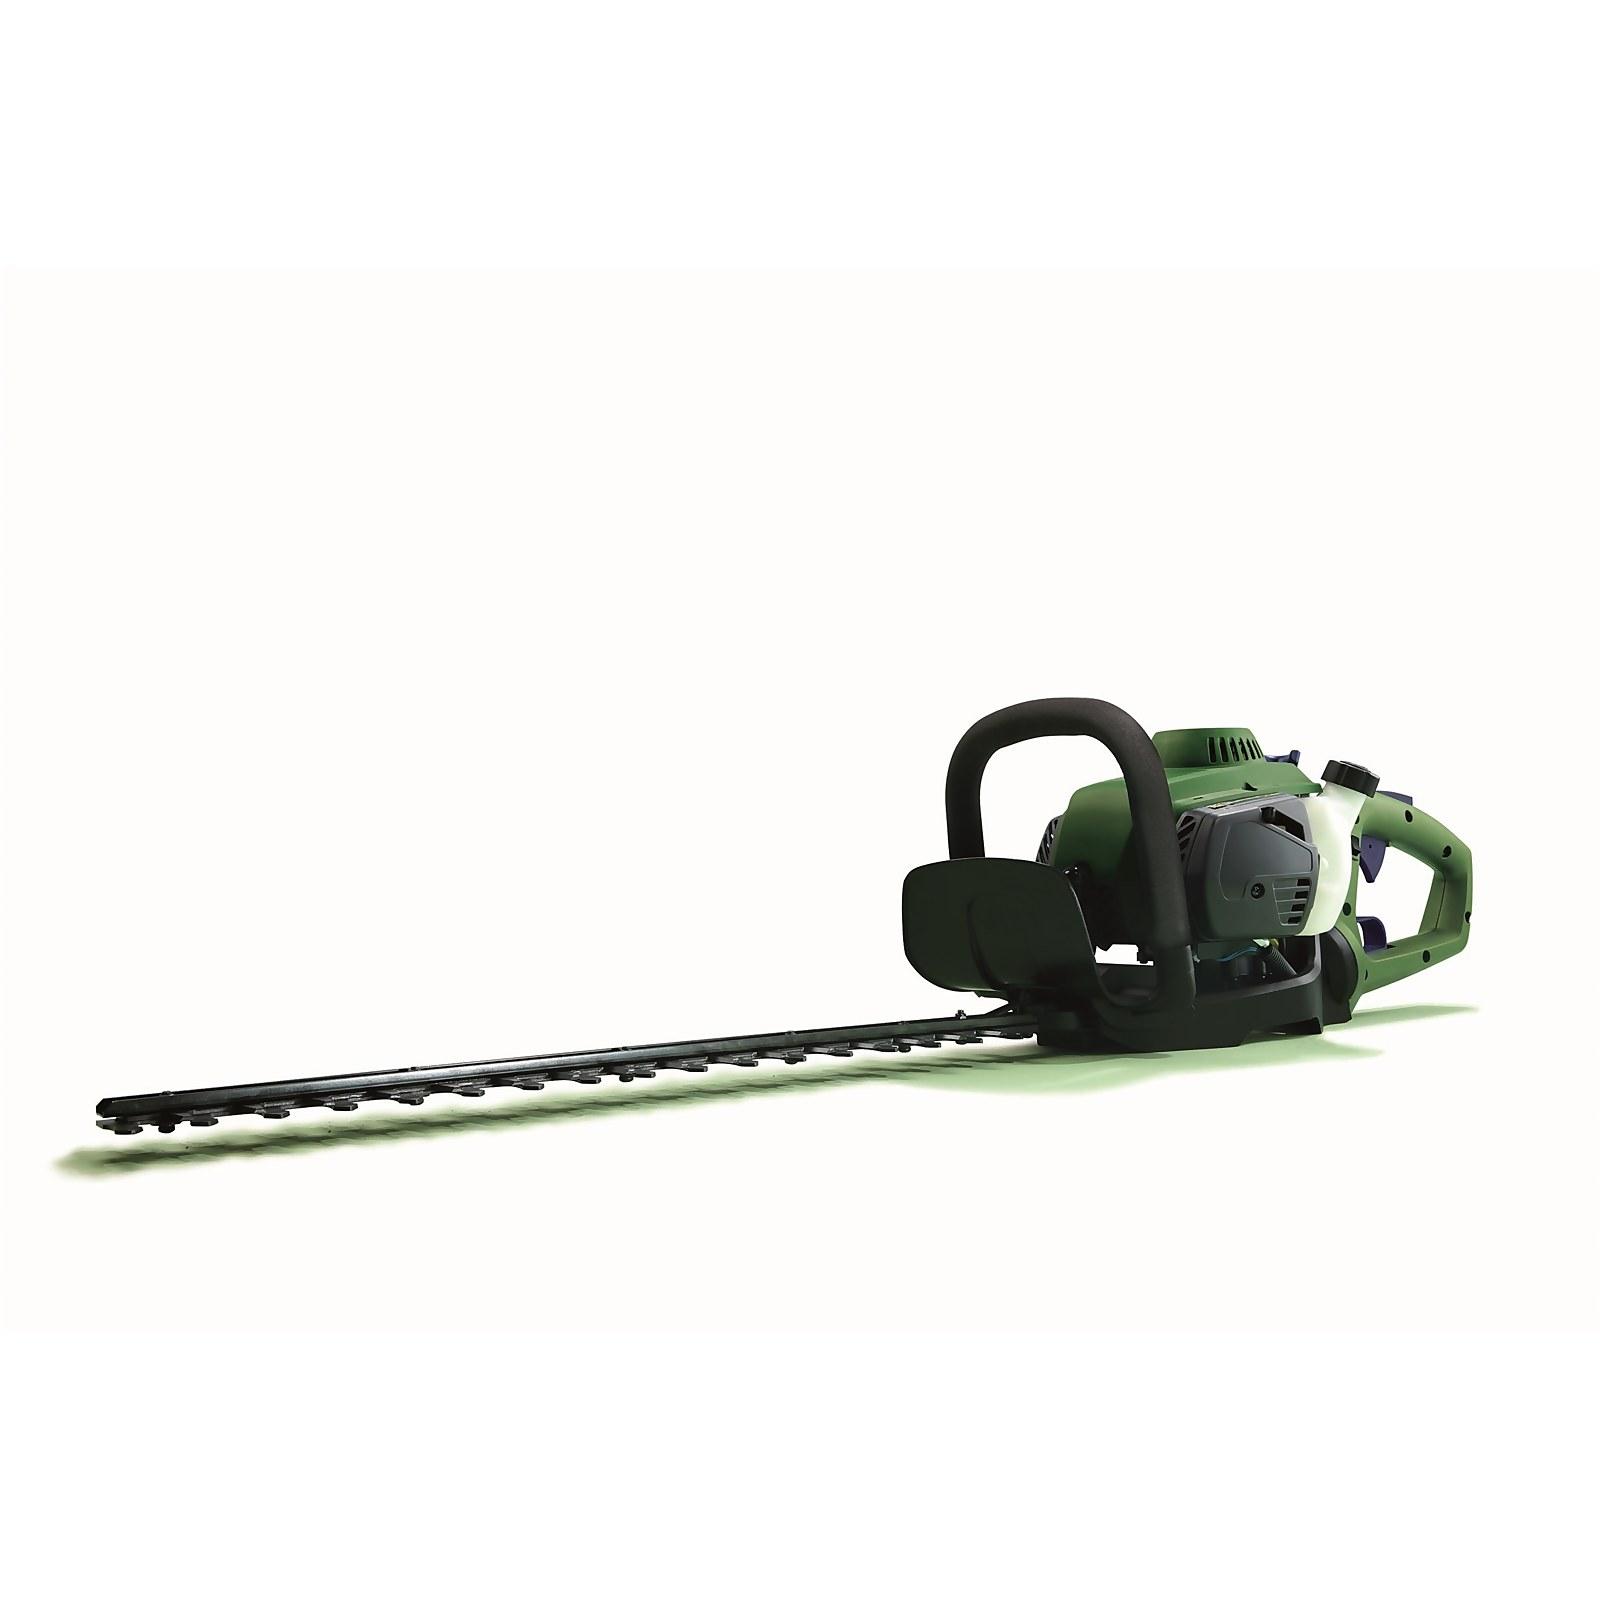 Powerbase 26cc Petrol Hedge Trimmer 55cm